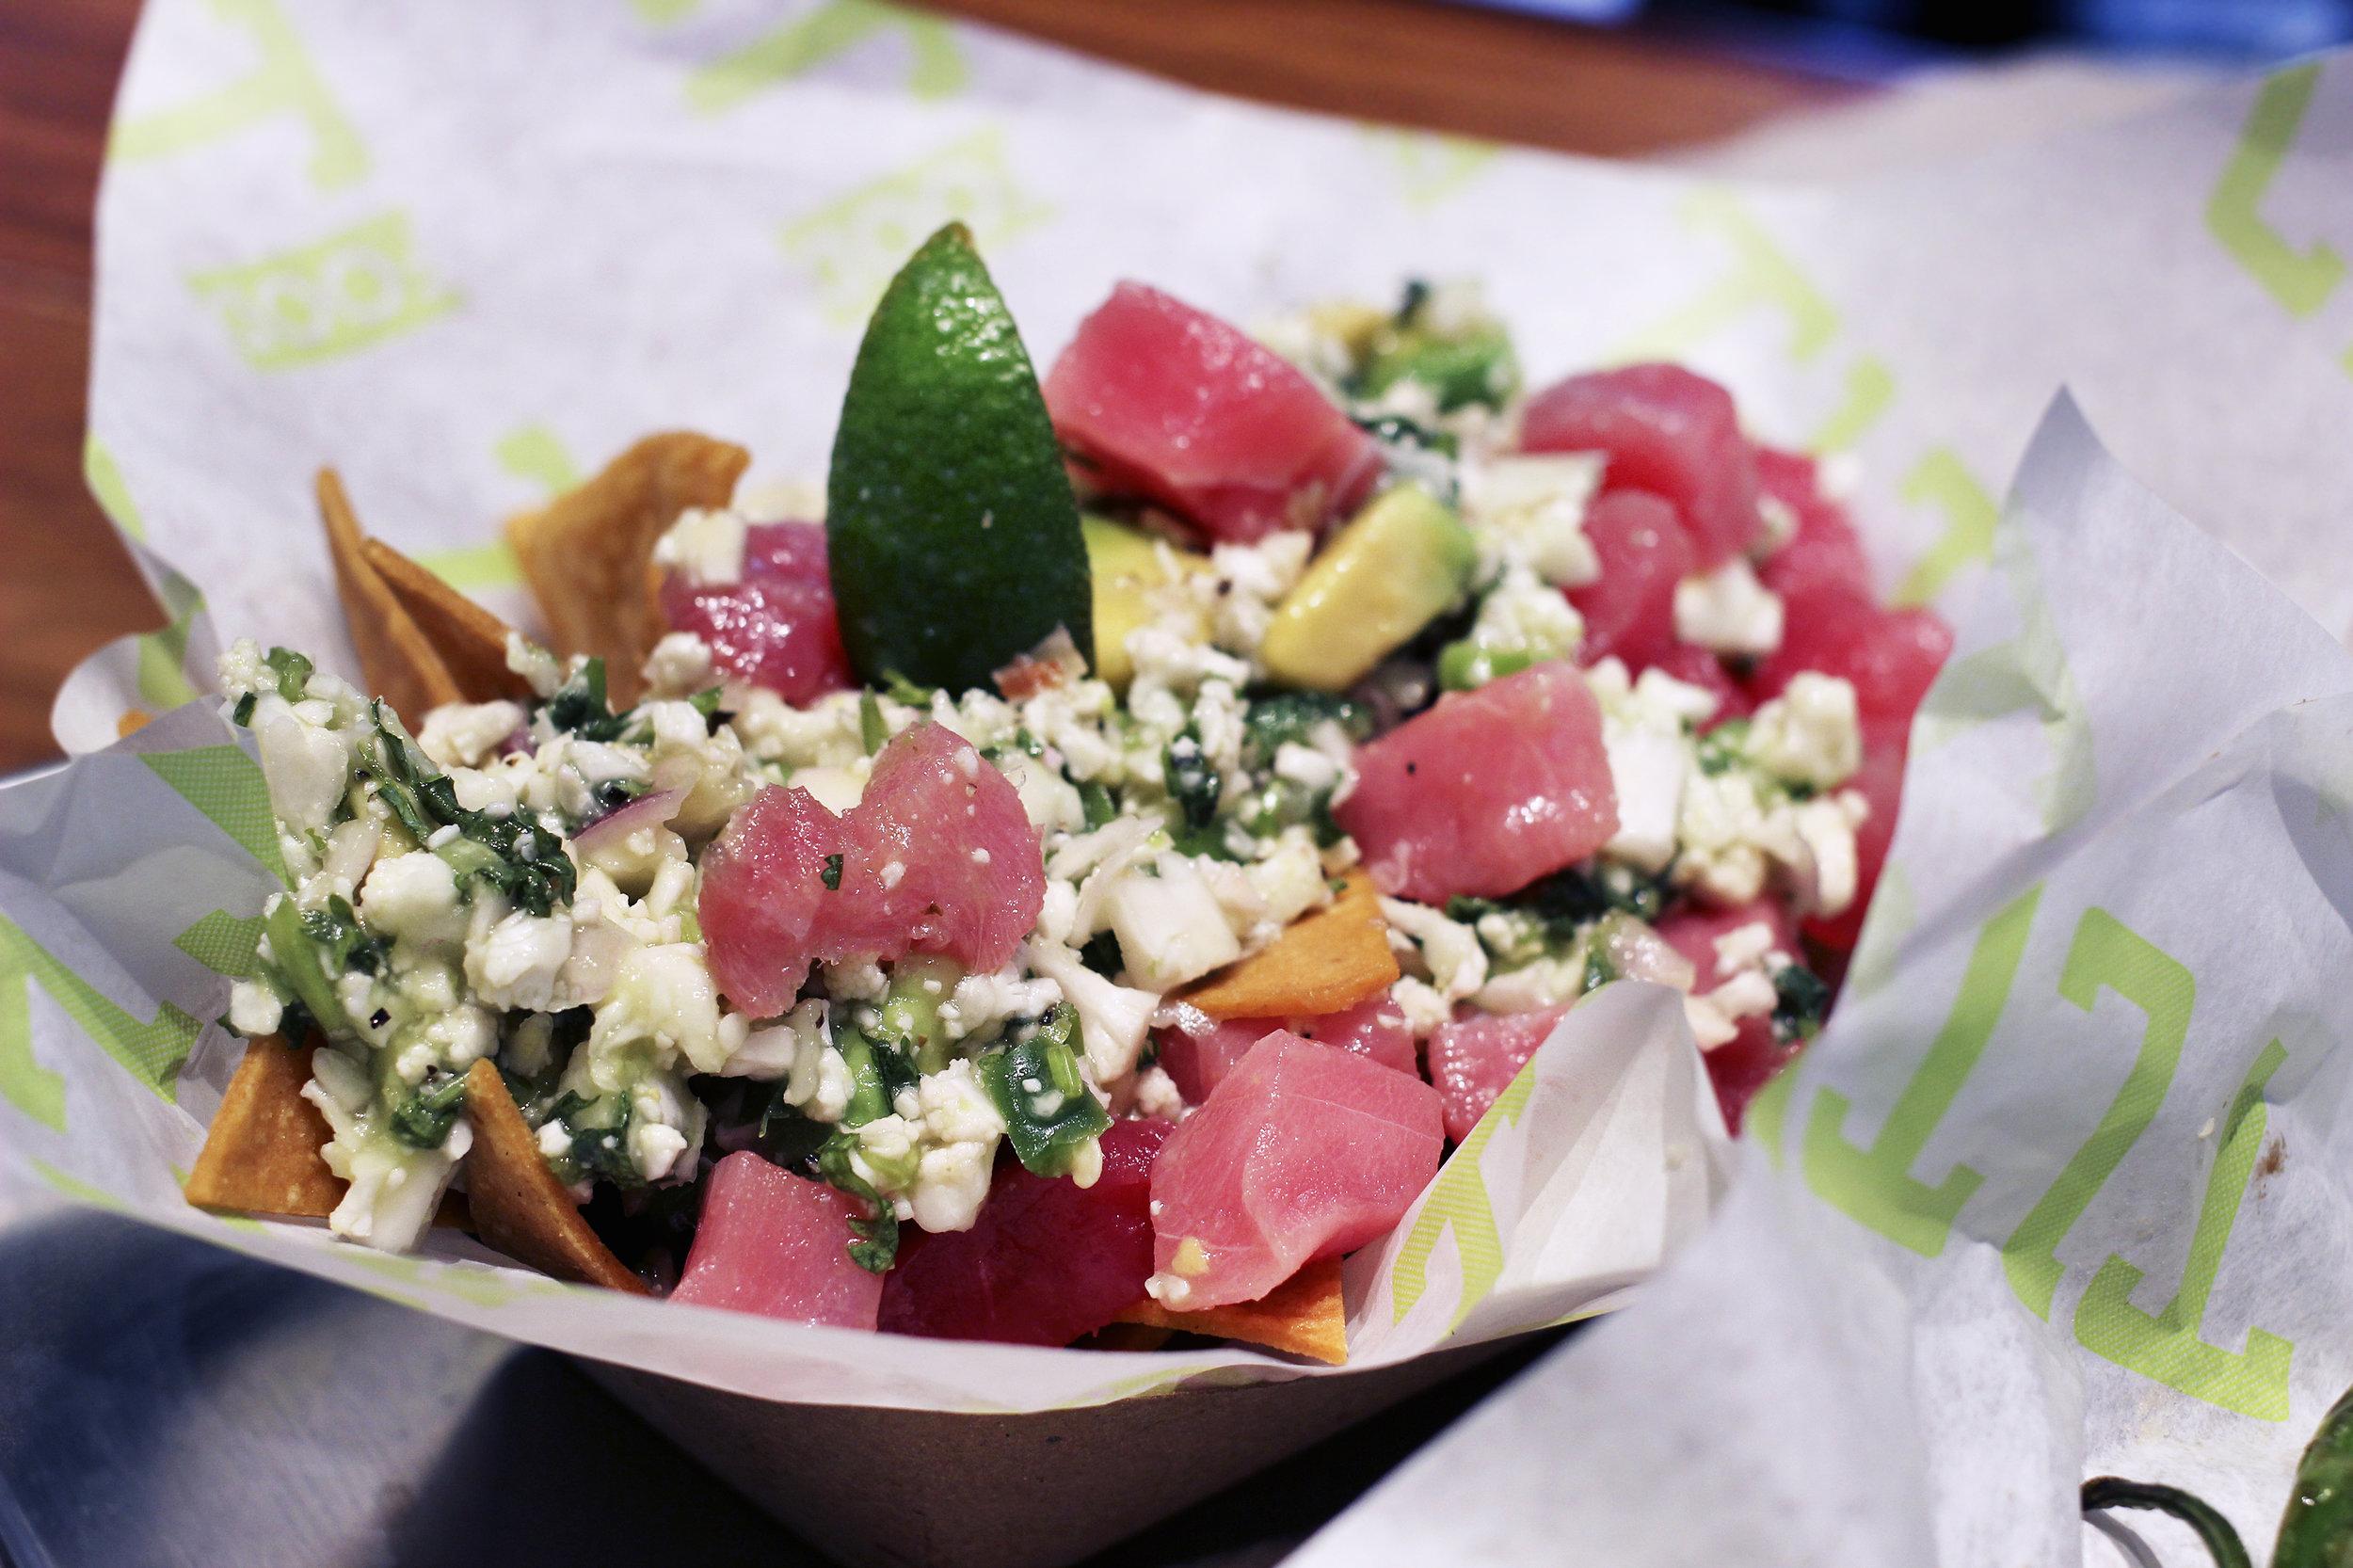 Cali Ceviche -Cauliflower, Avocado, Lime, Red Onion, Cilantro, Jalapeño, Corn Tortilla Chips. Additional charge to add tuna.